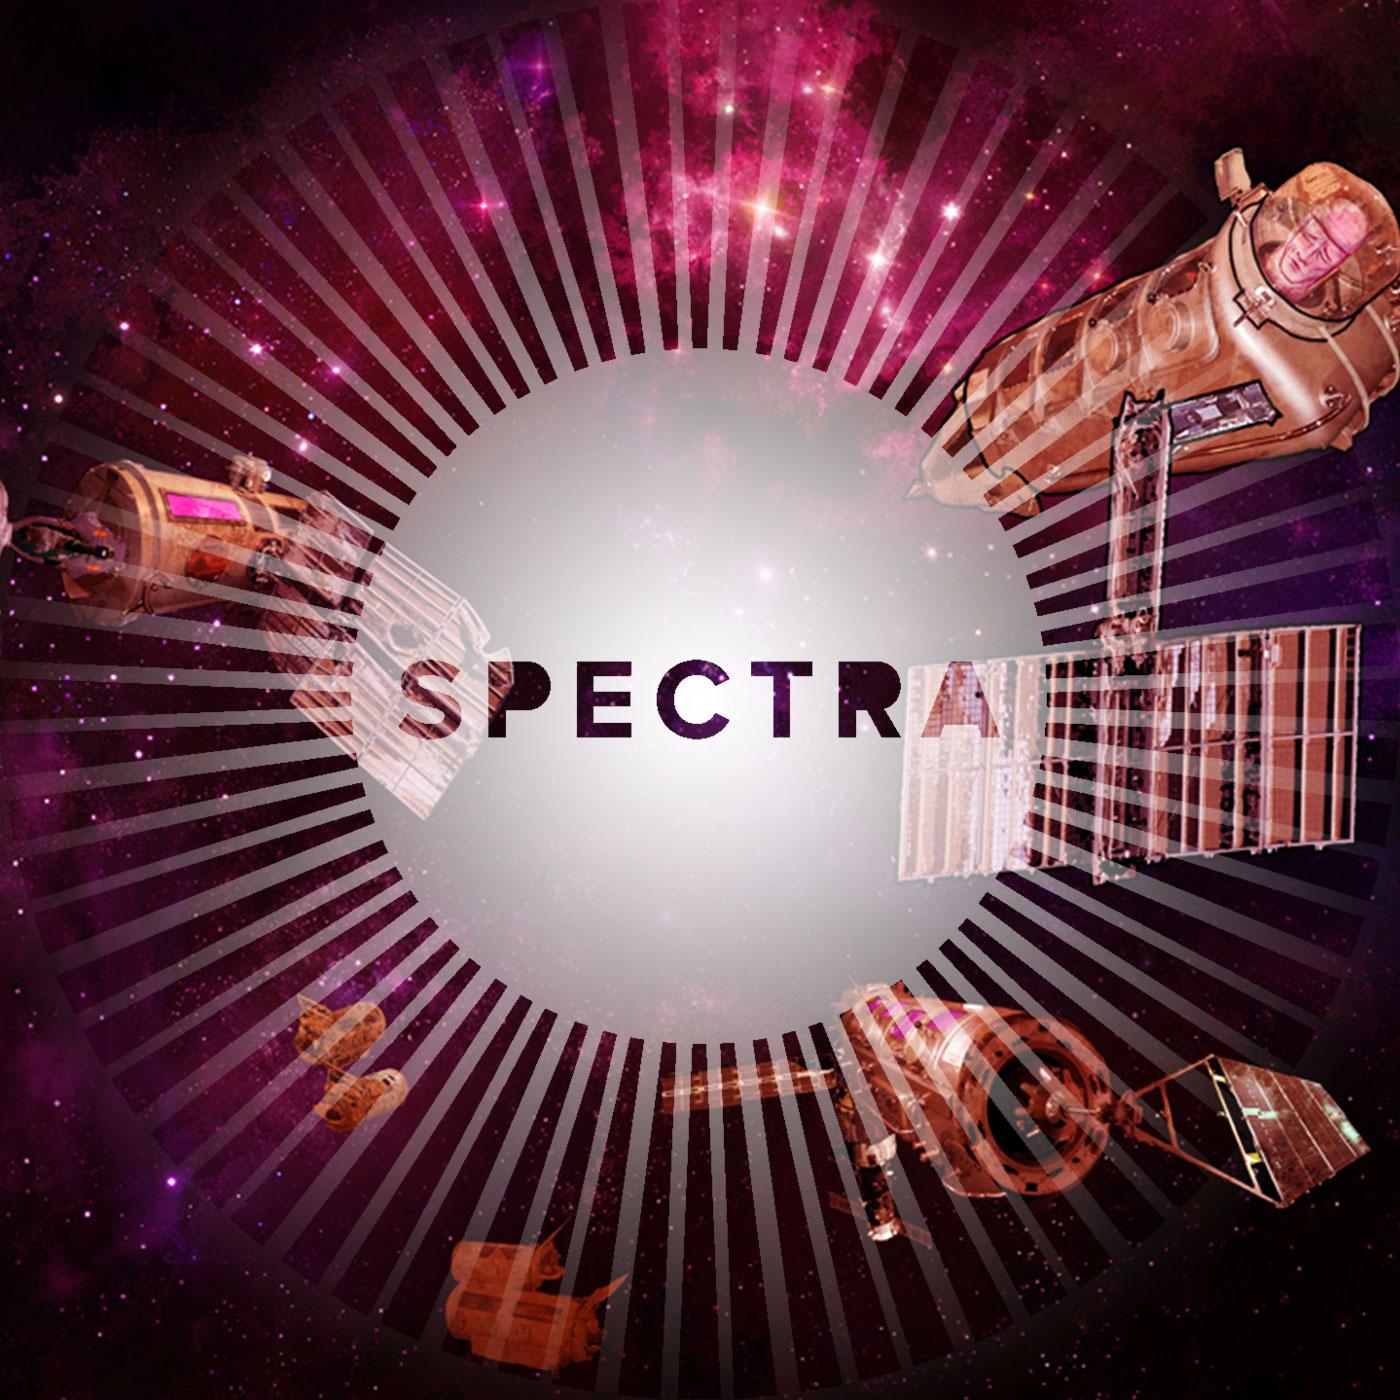 SPECTRA: Episode 9. Diversity Is Interesting